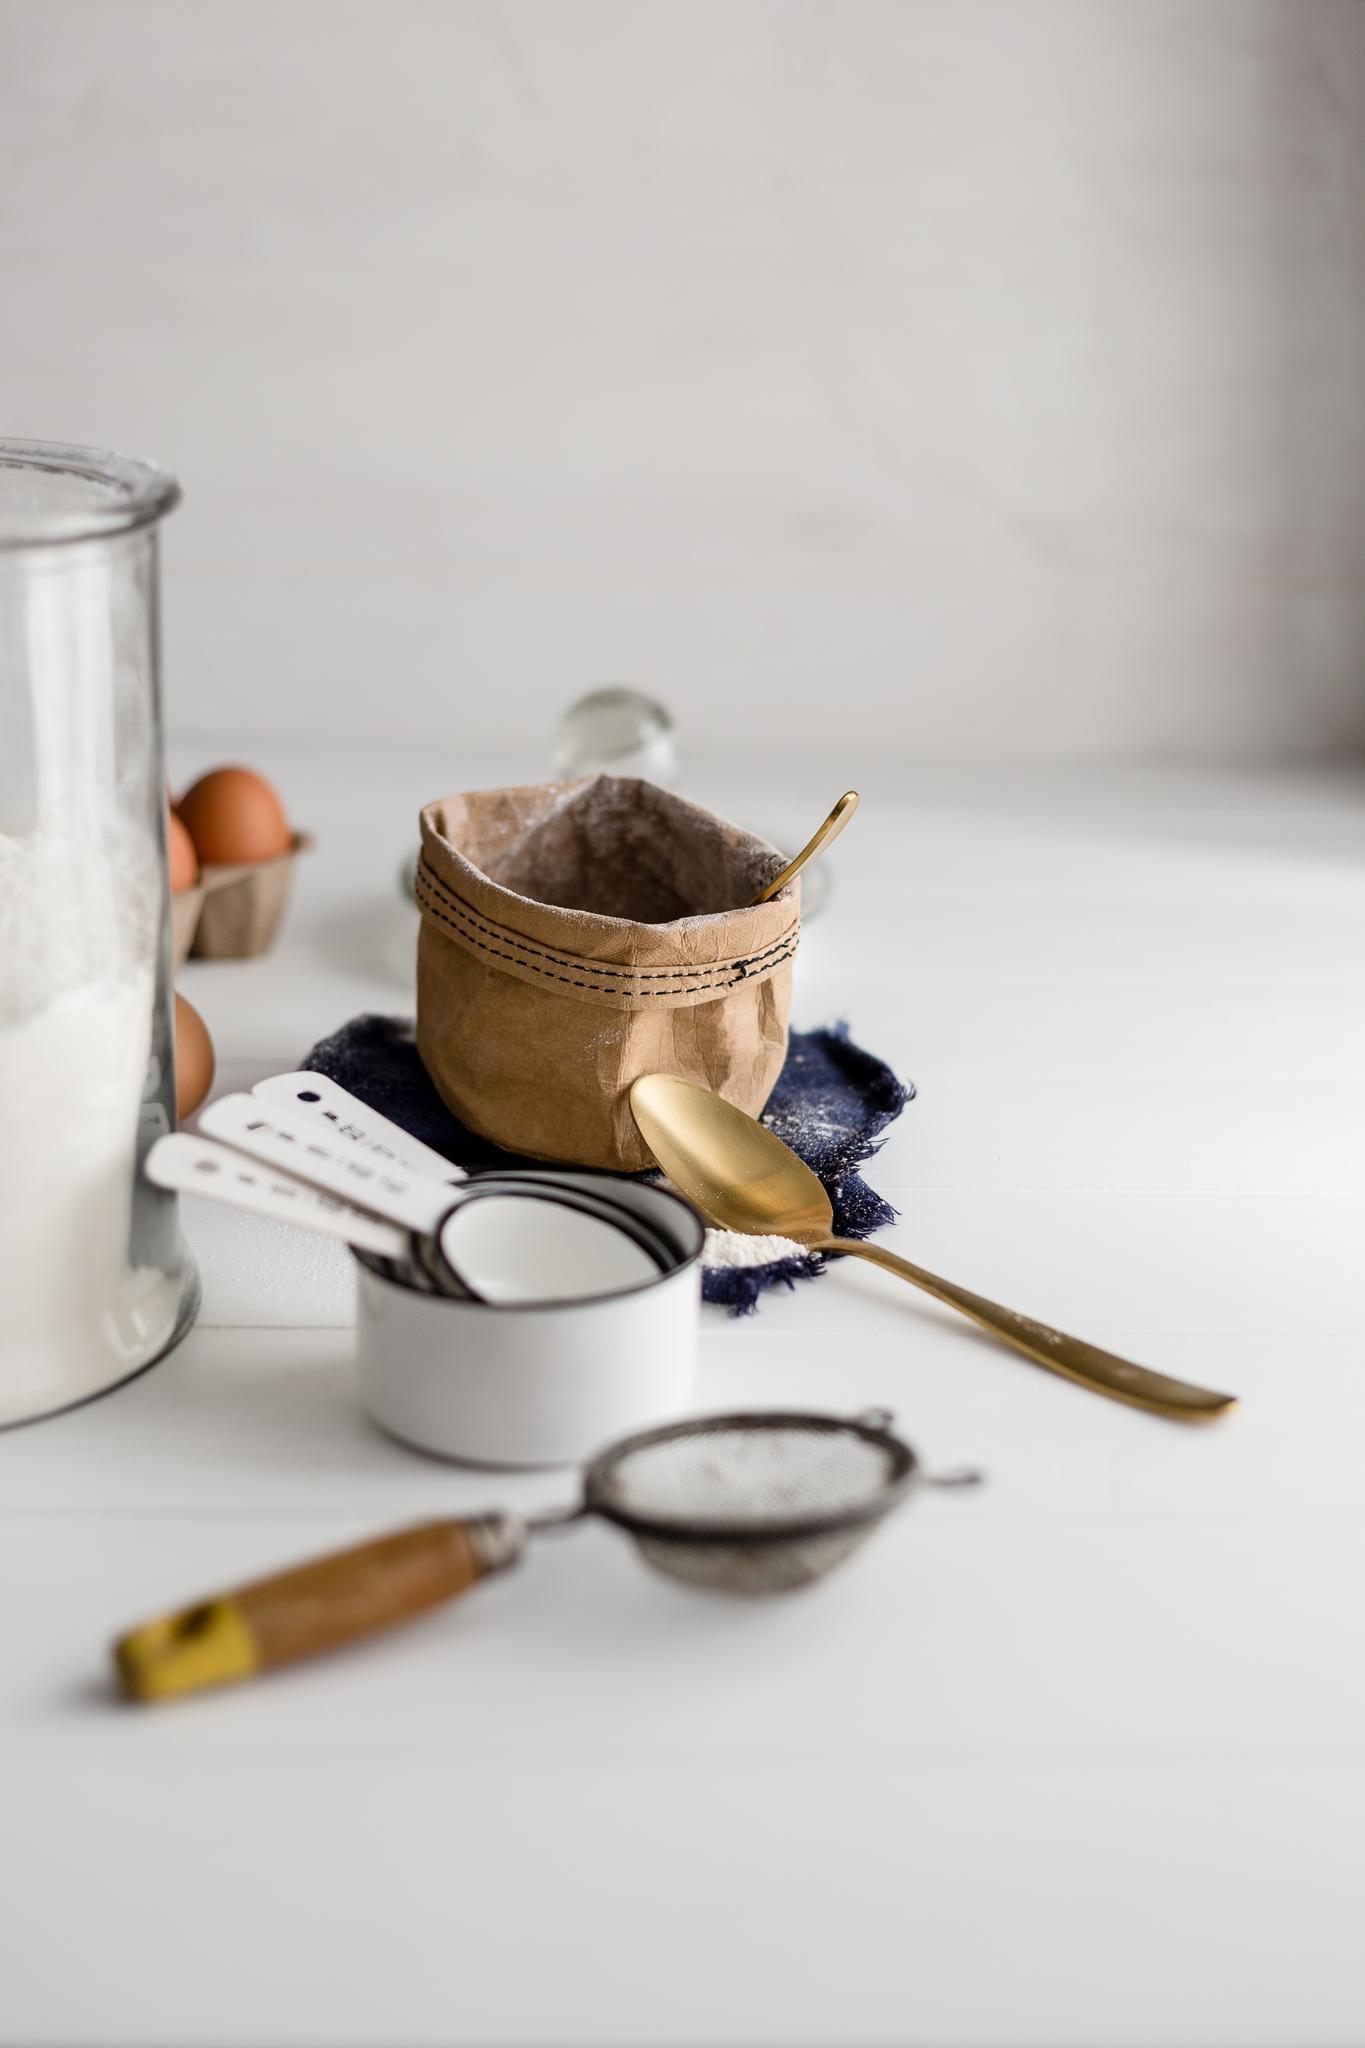 margaretriver-perth-food-photographer-stocked-foods-gluten-free-flour-mix-2